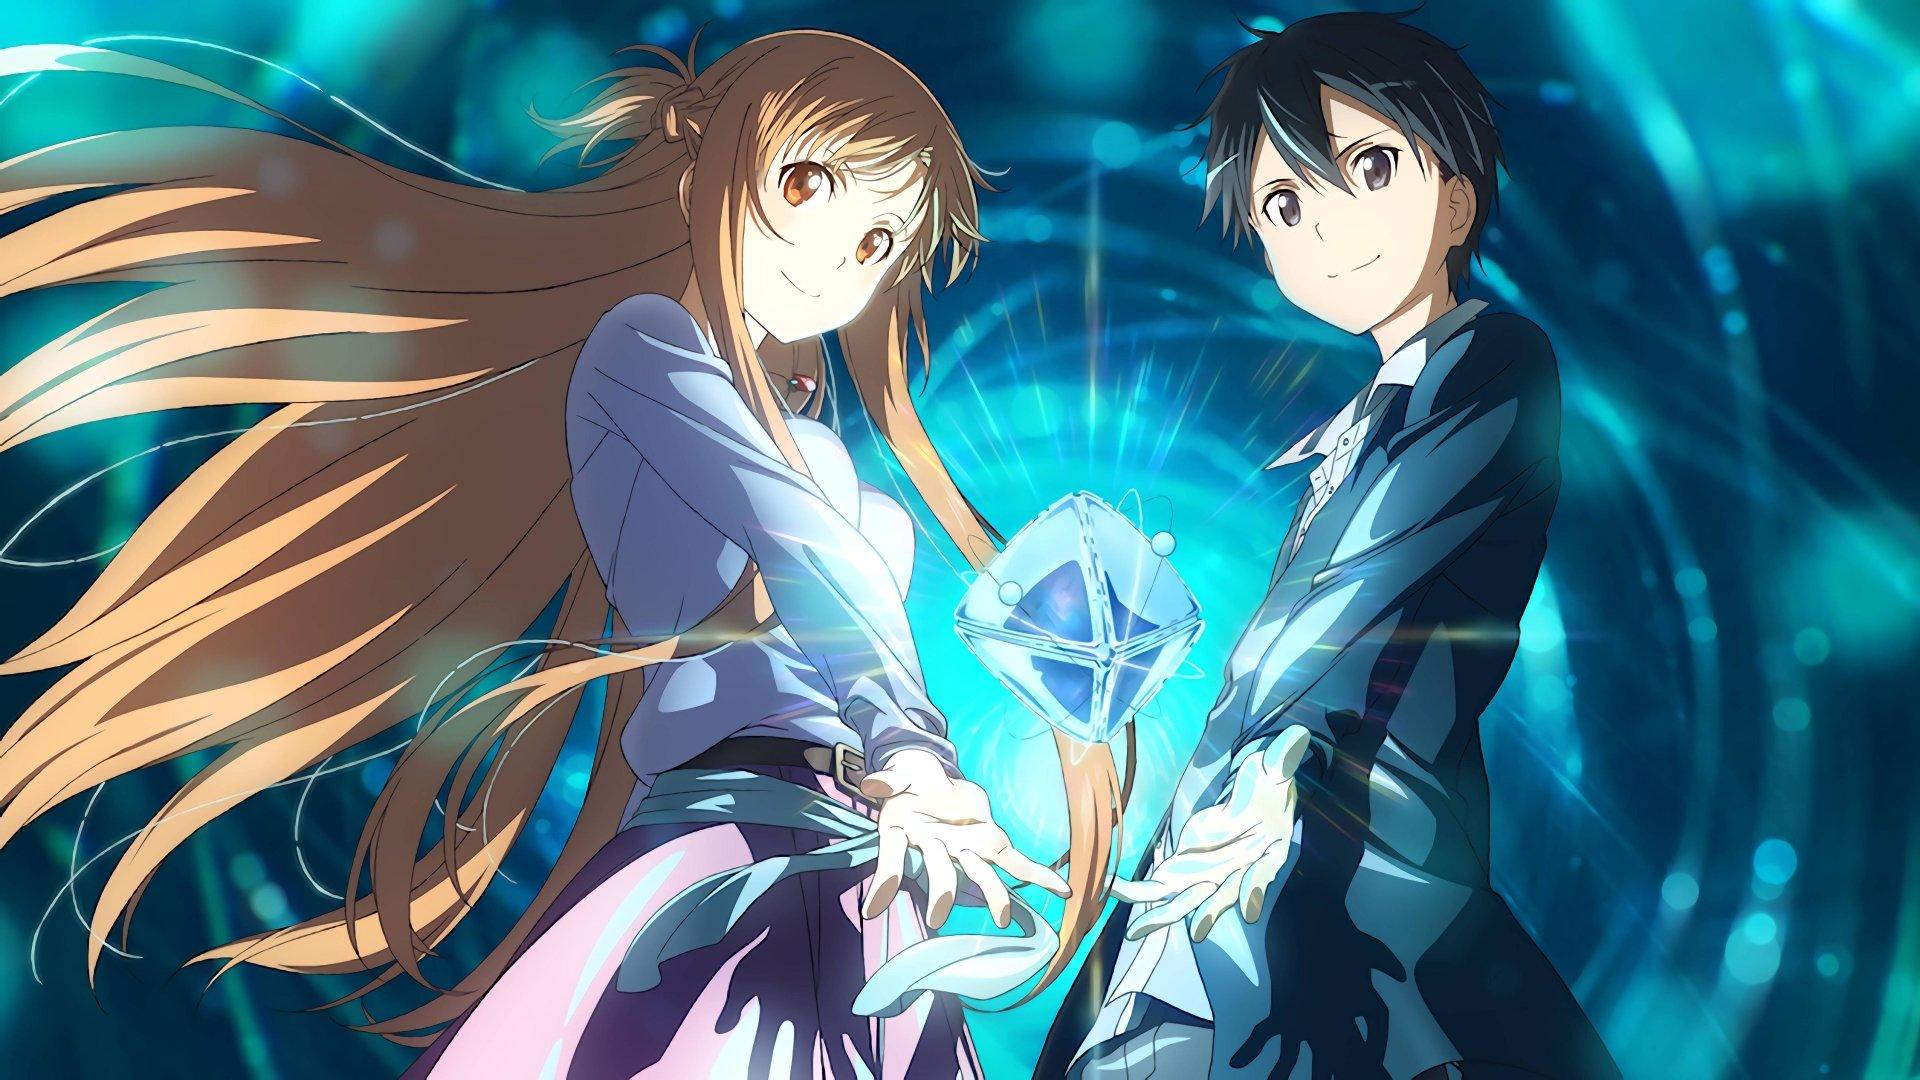 Anime - Sword Art Online Movie: Ordinal Scale  Kazuto Kirigaya Asuna Yuuki Sword Art Online Ordinal Scale Wallpaper